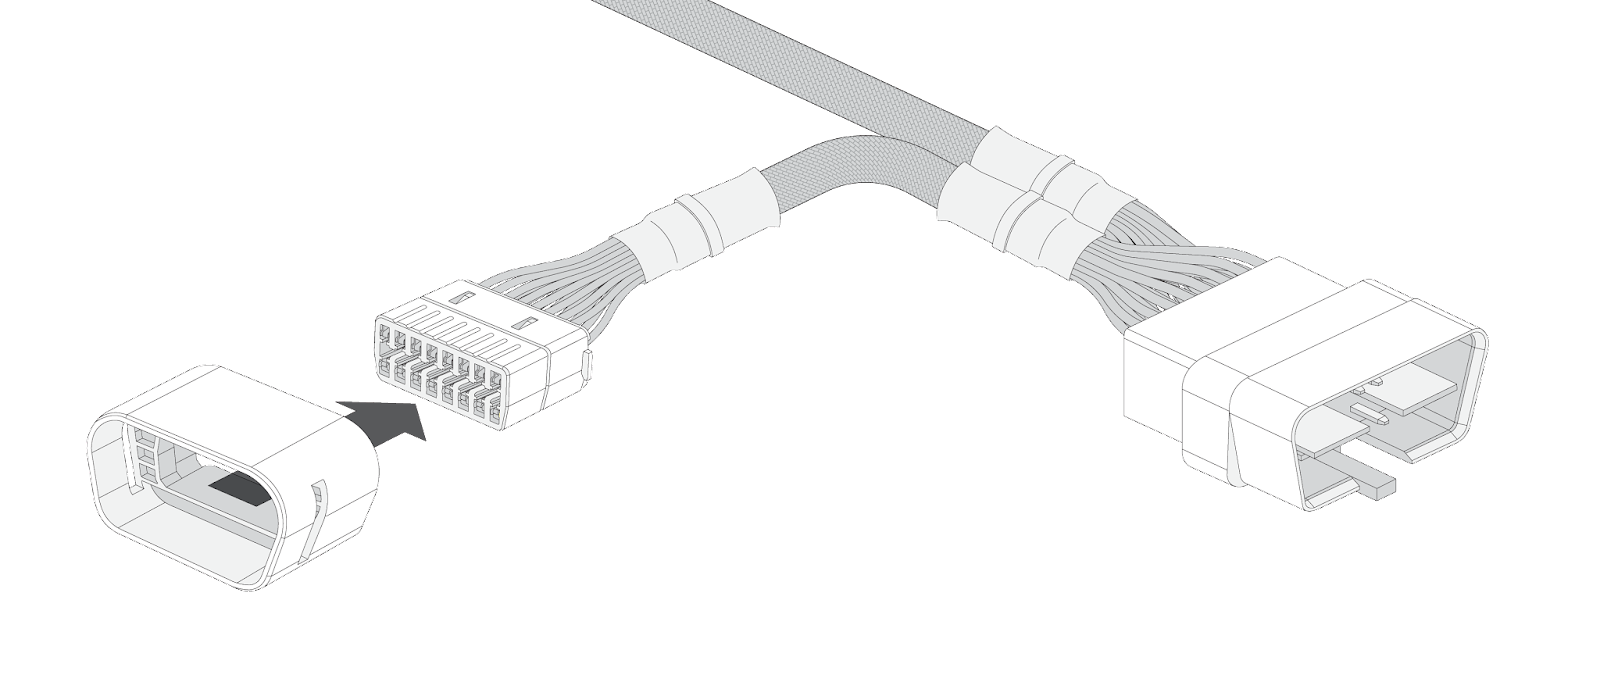 universal-harness-setup-figure9.png